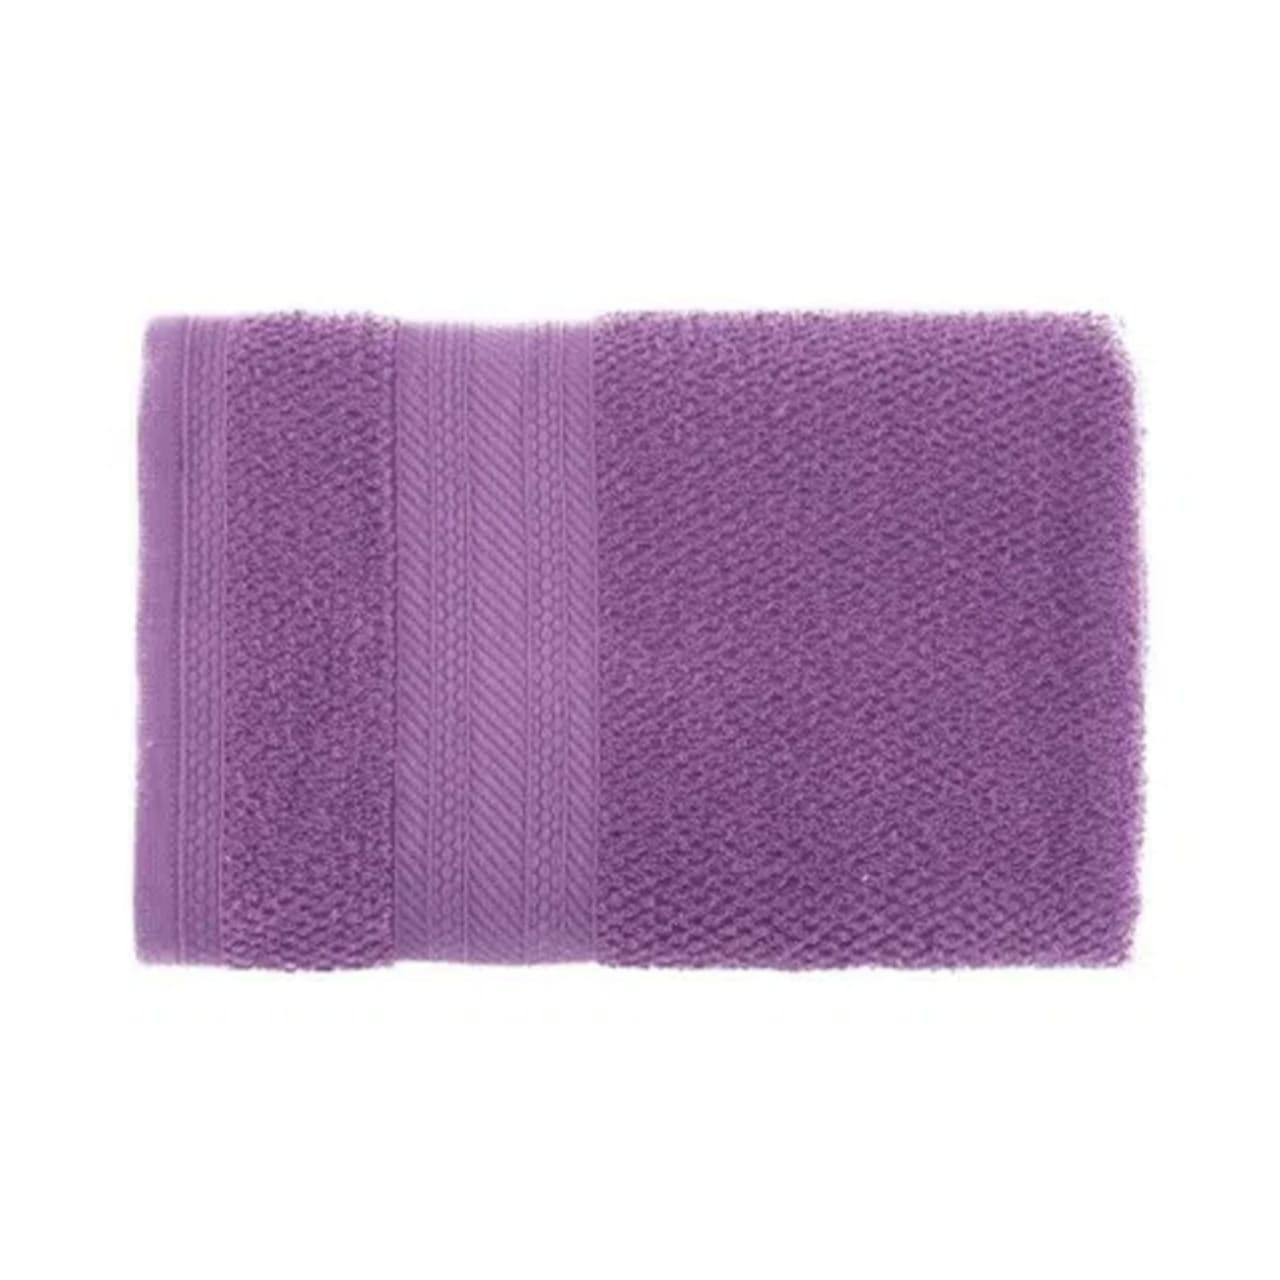 Toalha rosto empire 48x70 Púrpura